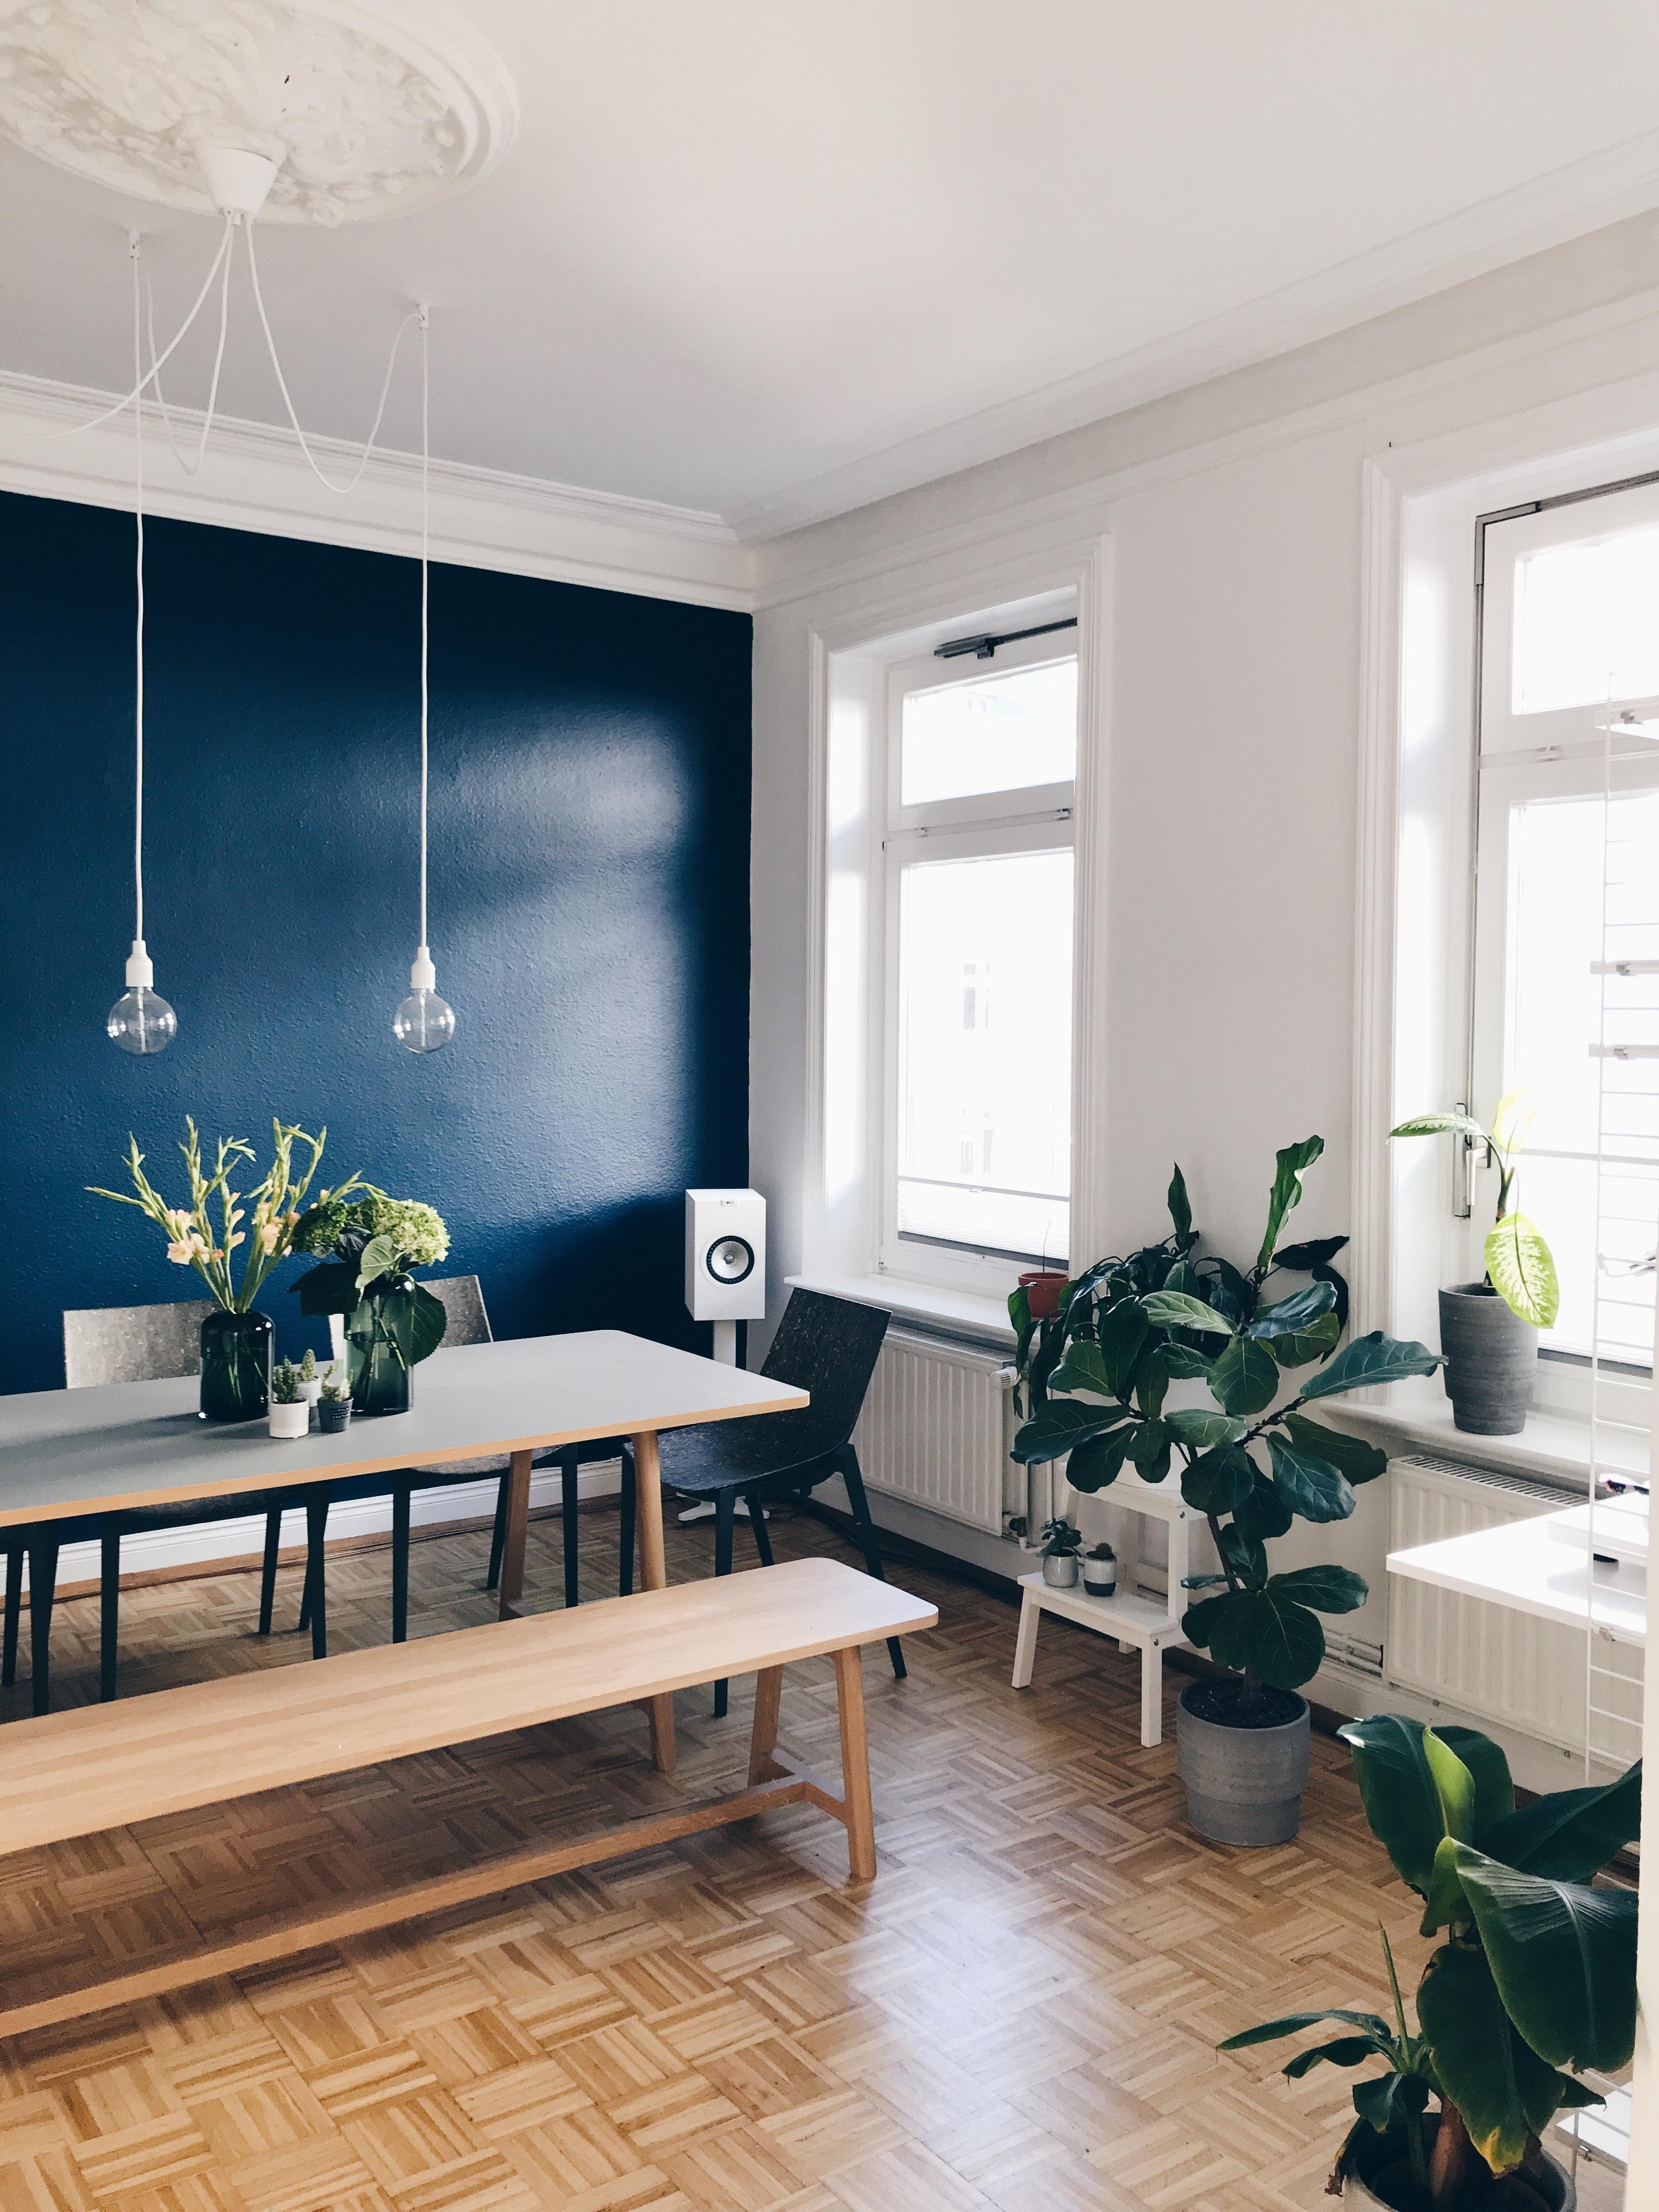 Schlafzimmer Ideen Dunkelblau Petrolfarbene Wandfarbe Bilder And